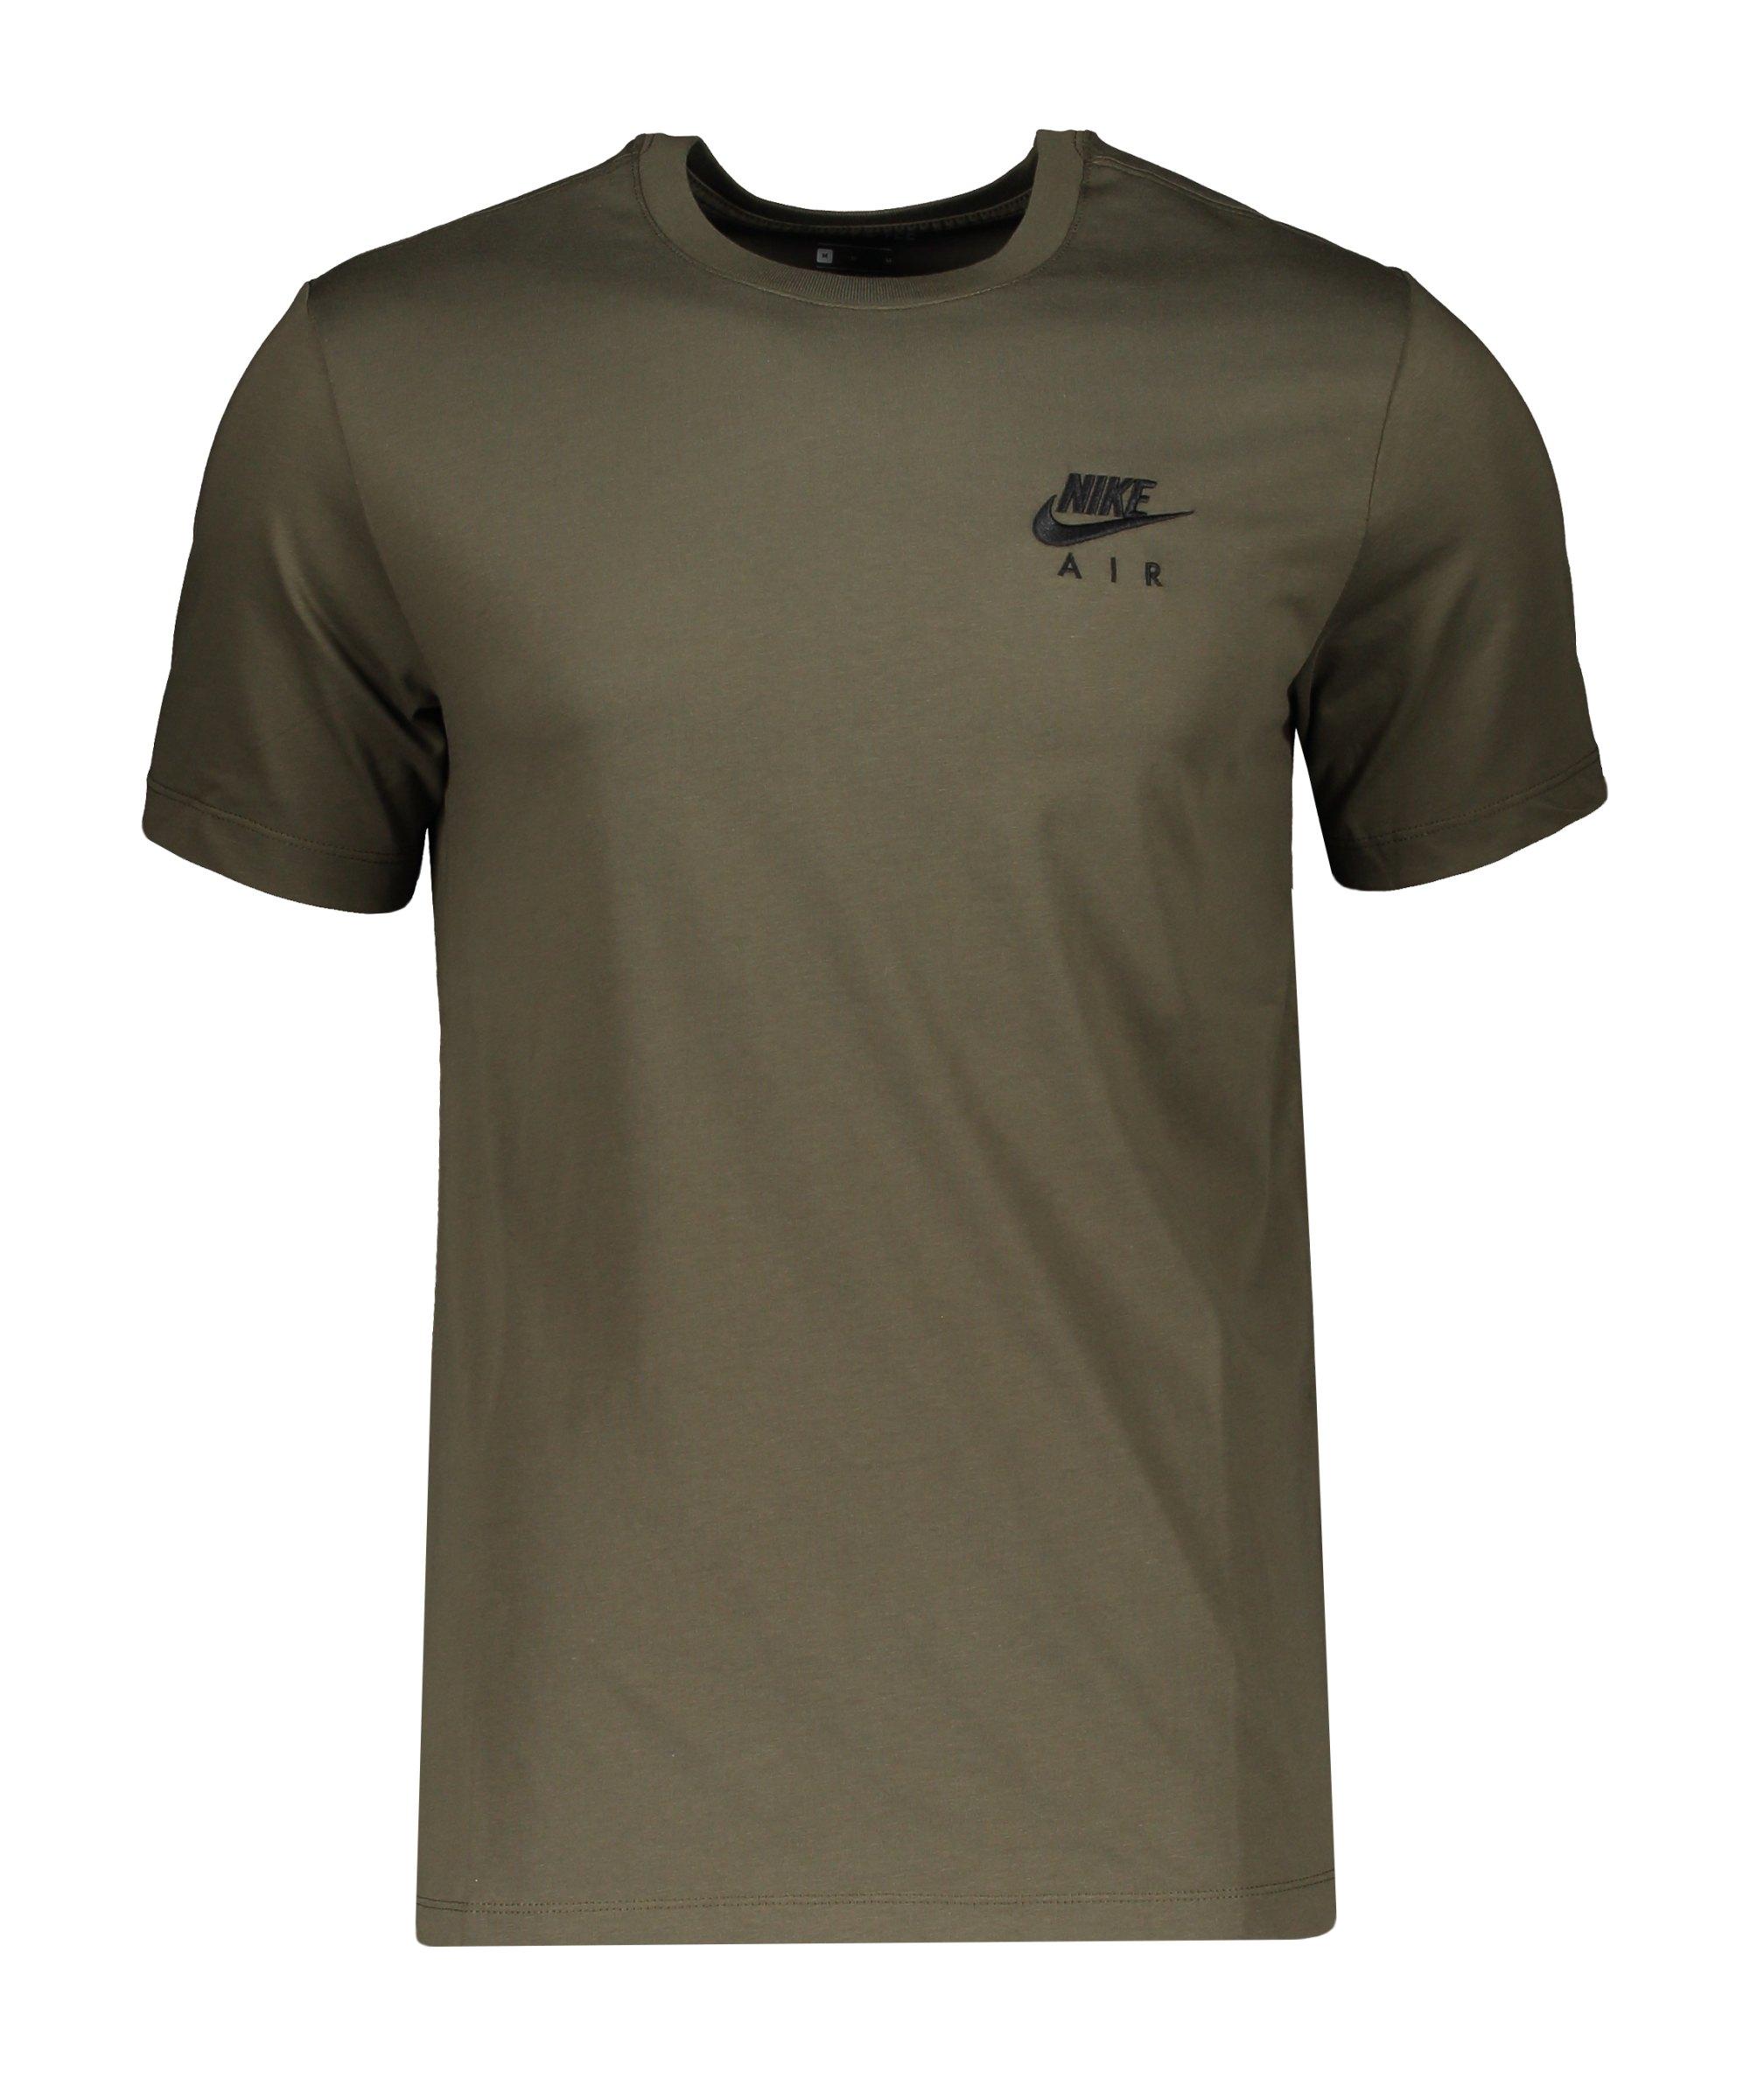 Nike Air LBR T-Shirt Grün F325 - gruen